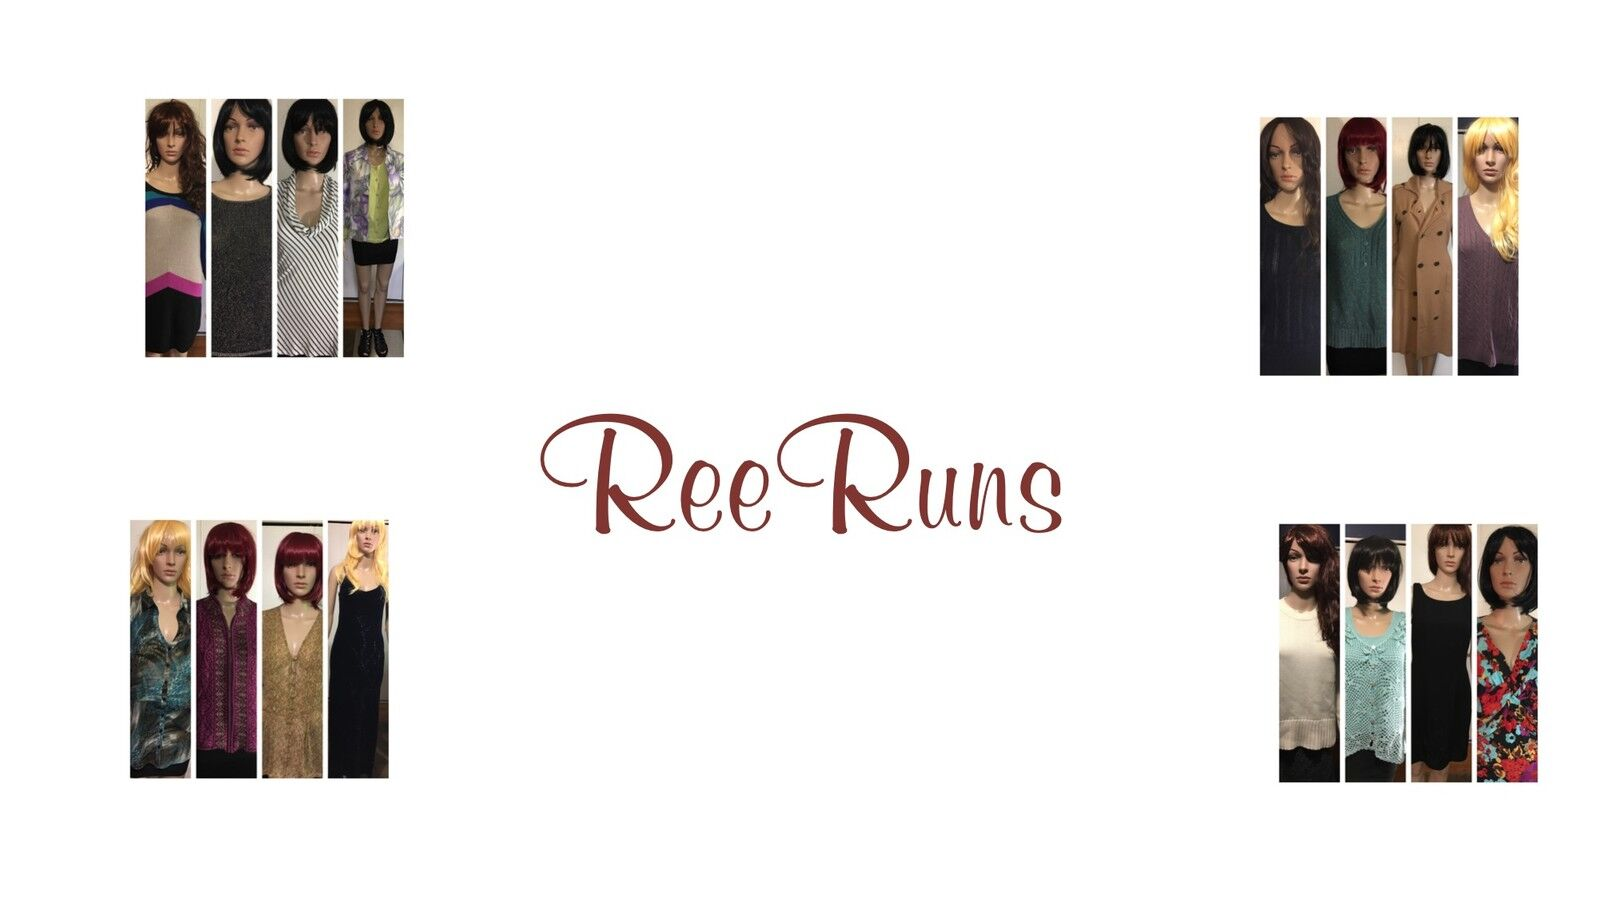 ReeRuns